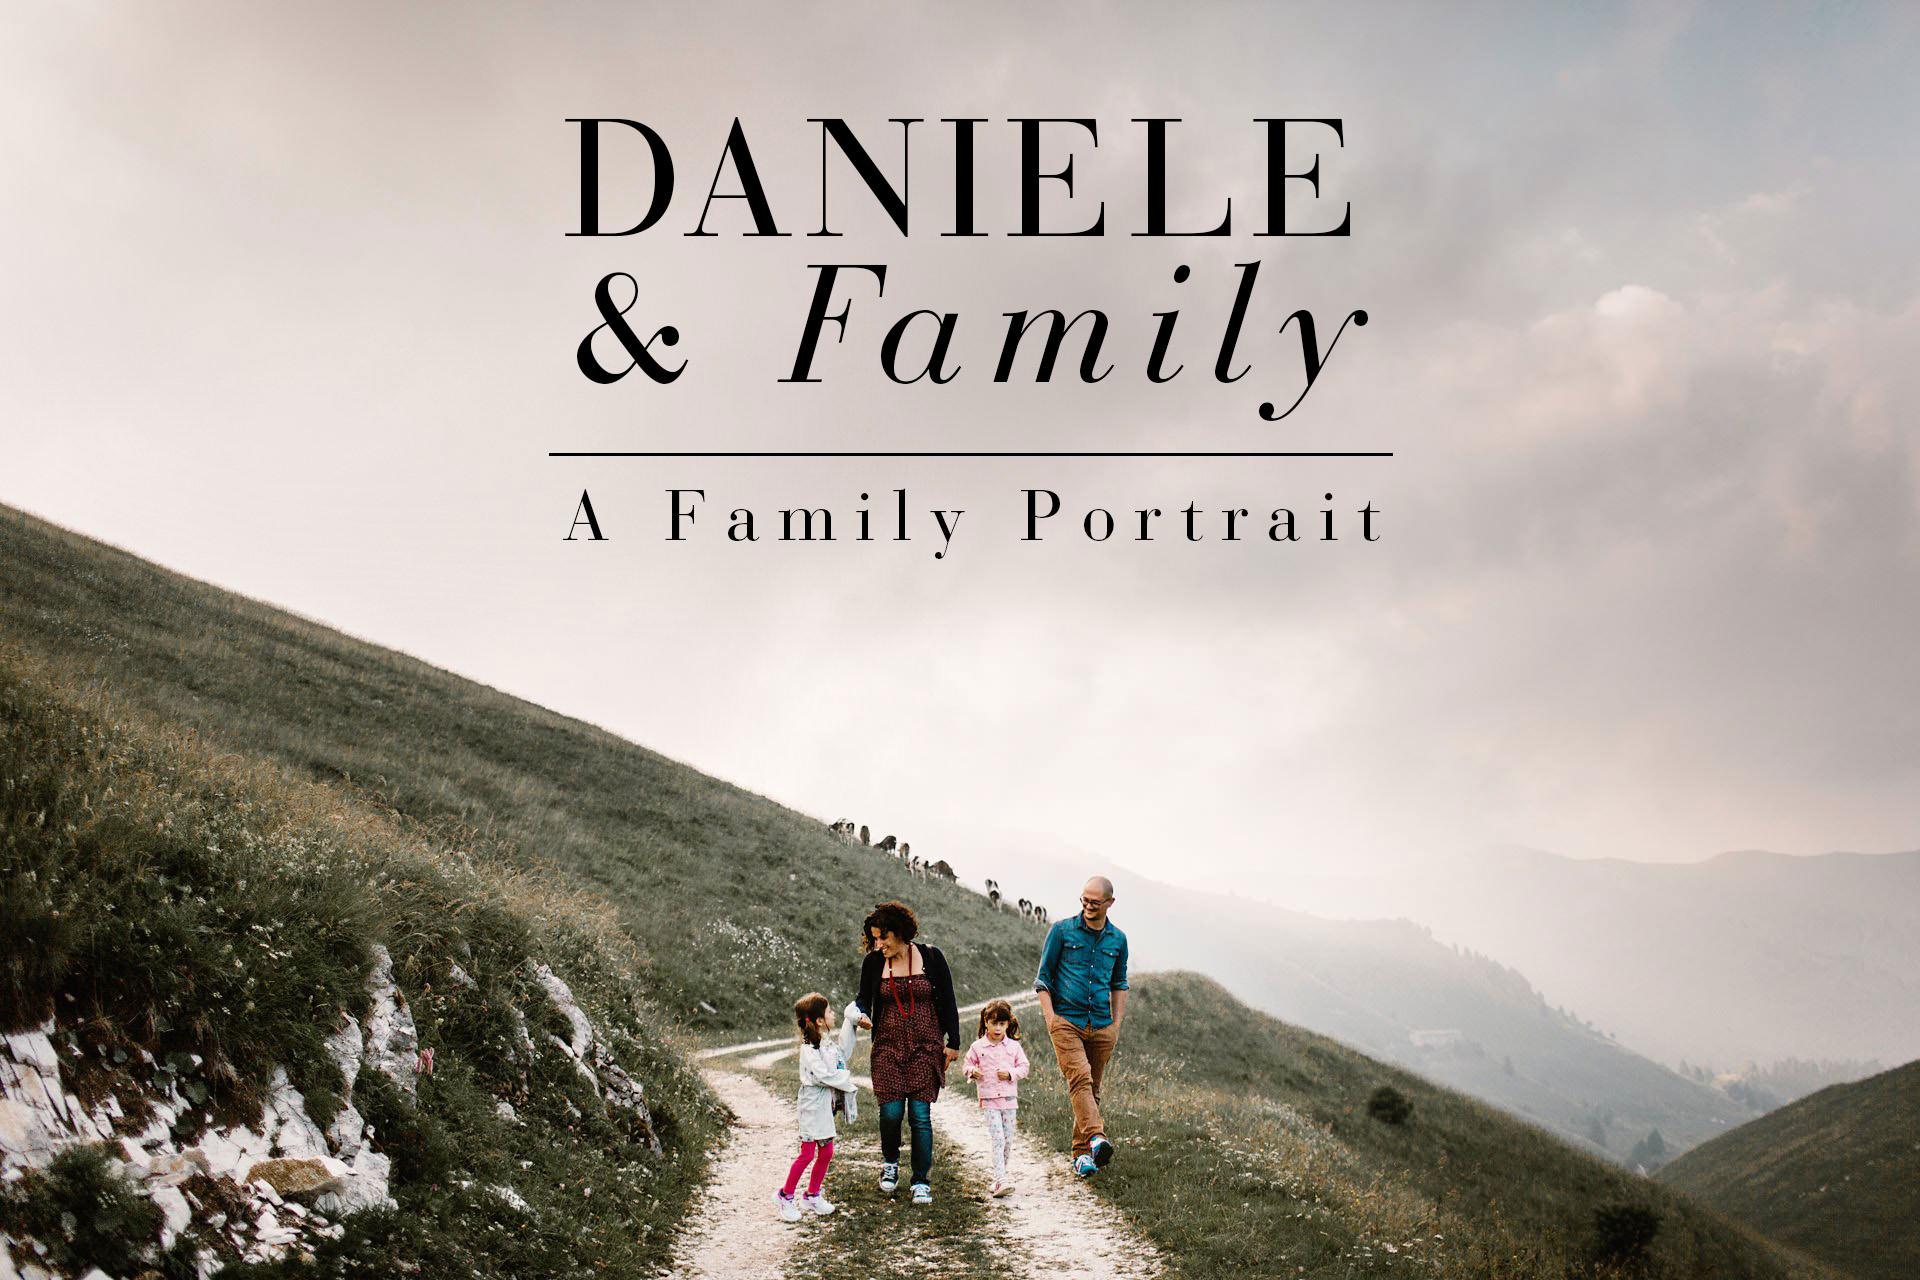 Daniele & Family